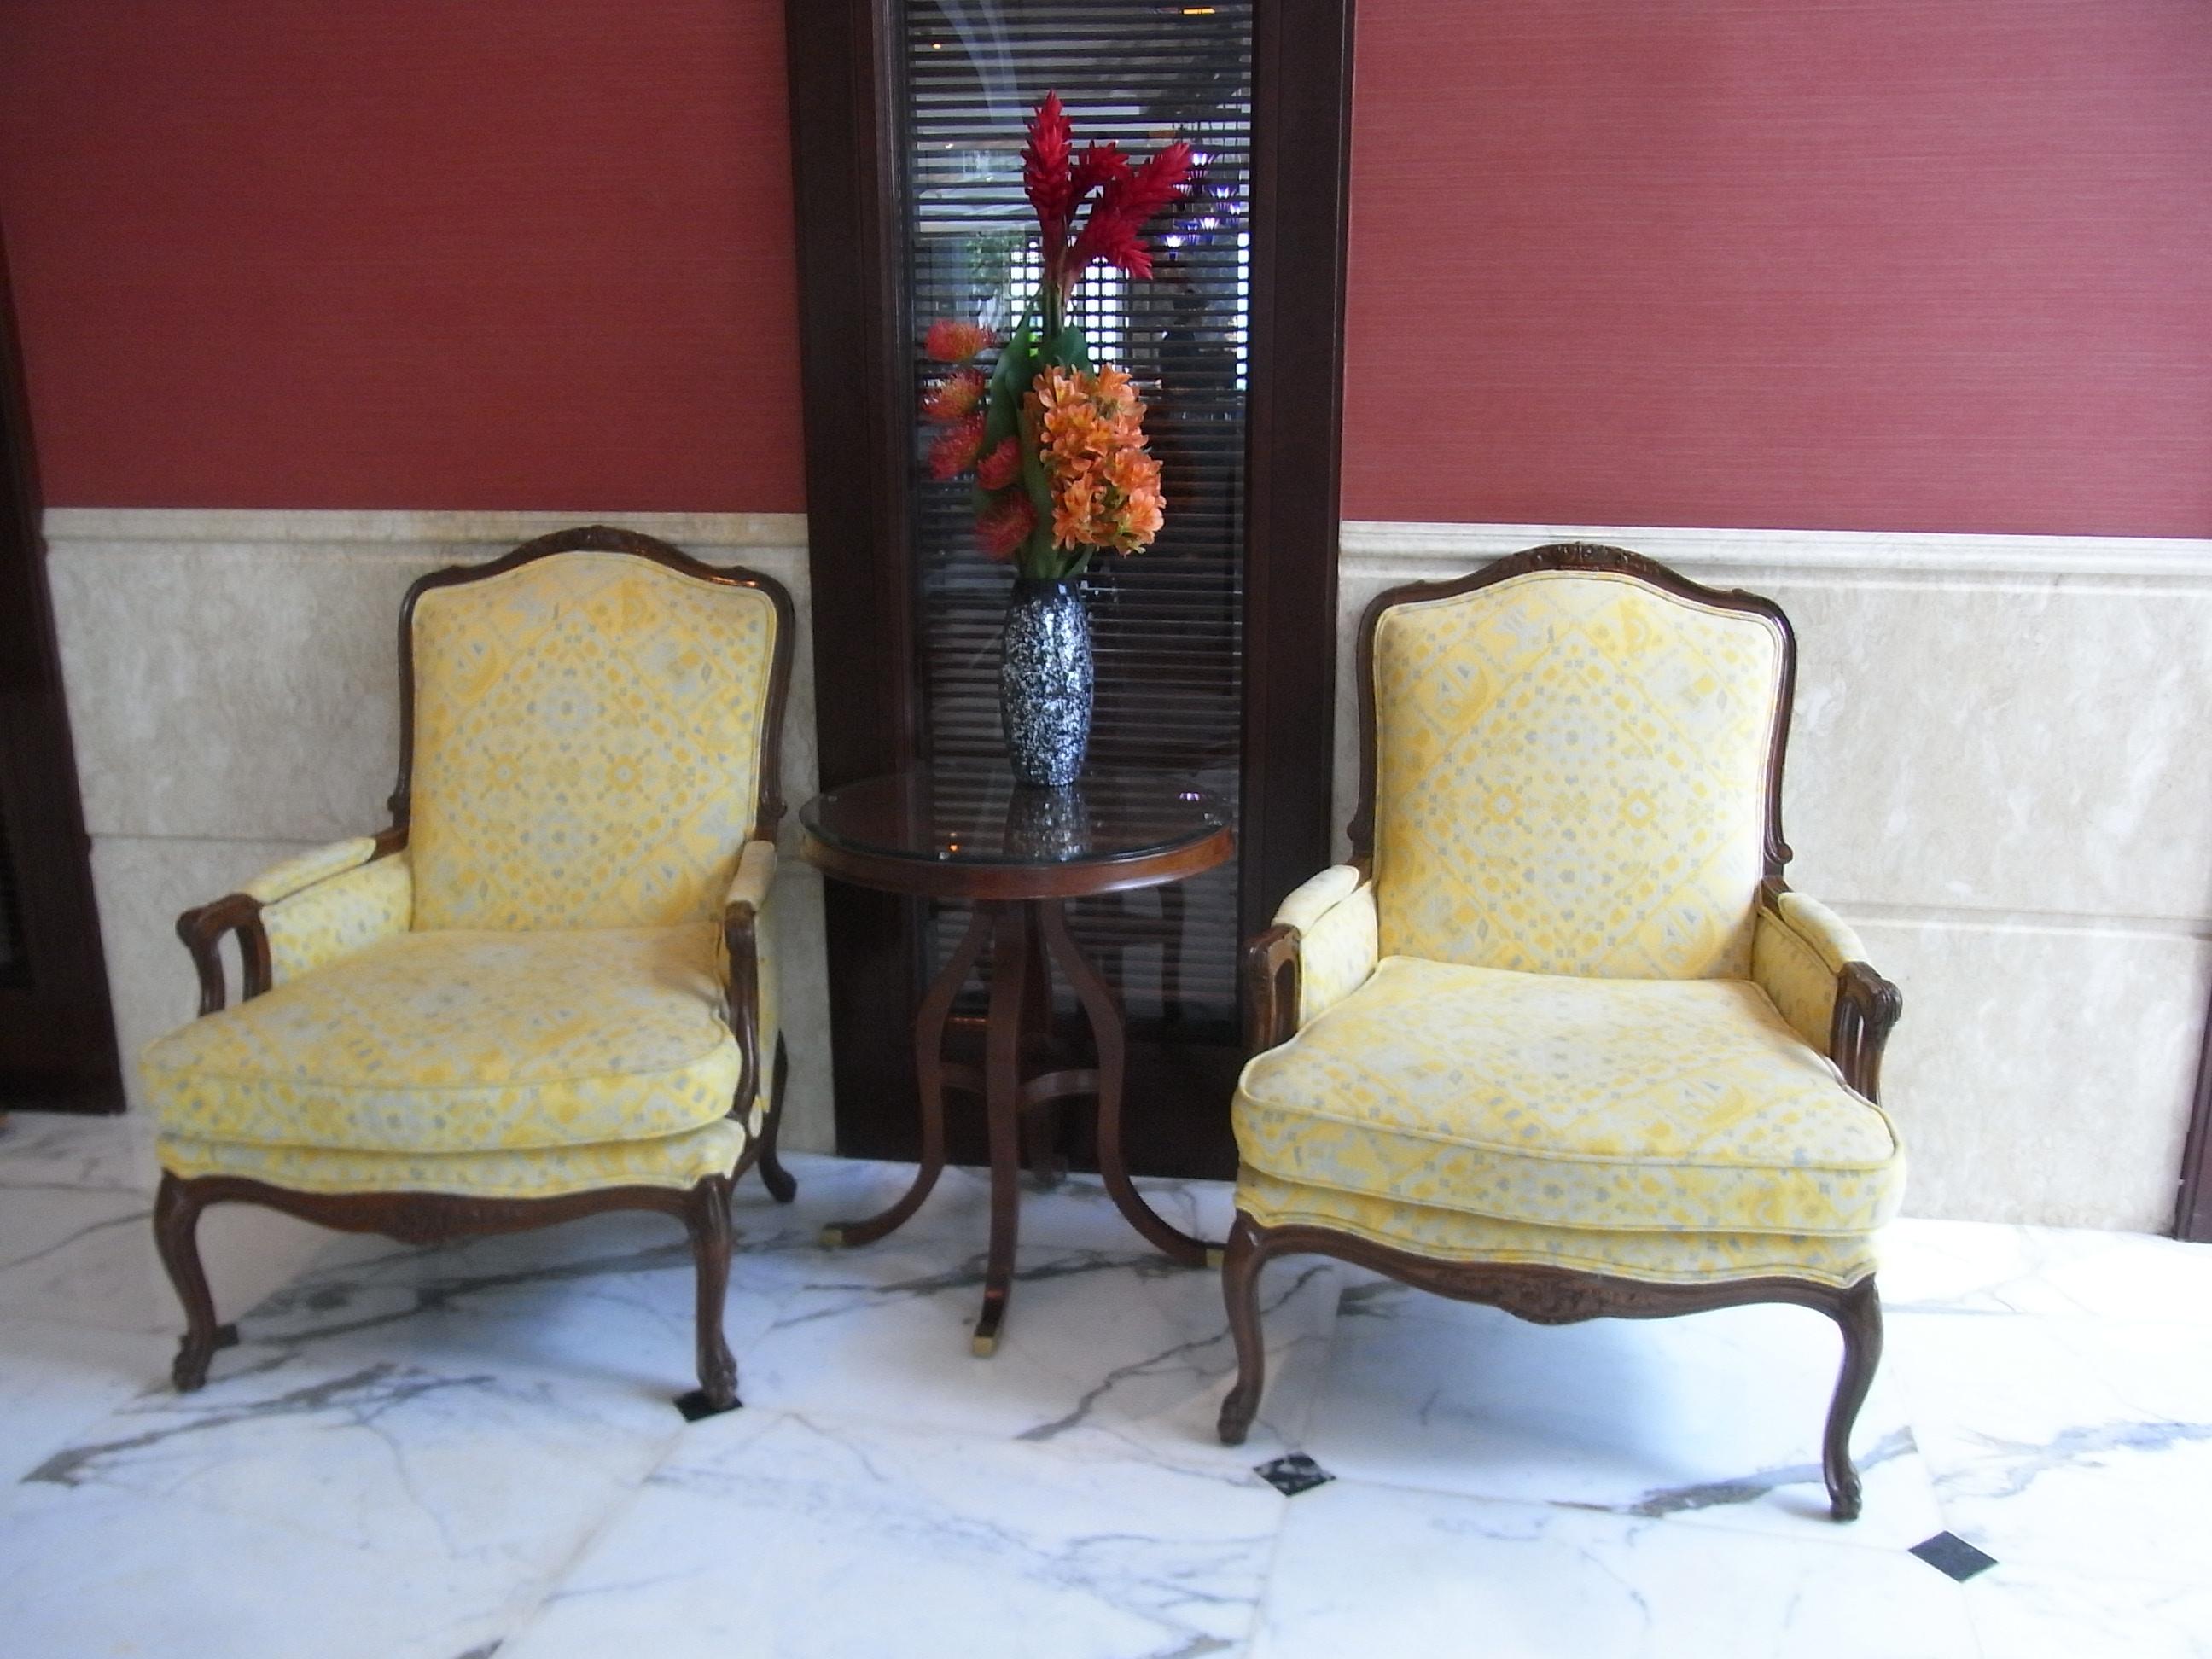 Filehk admiralty island shangri la hotel interior furniture talbe n armchairs aug 2012 jpg